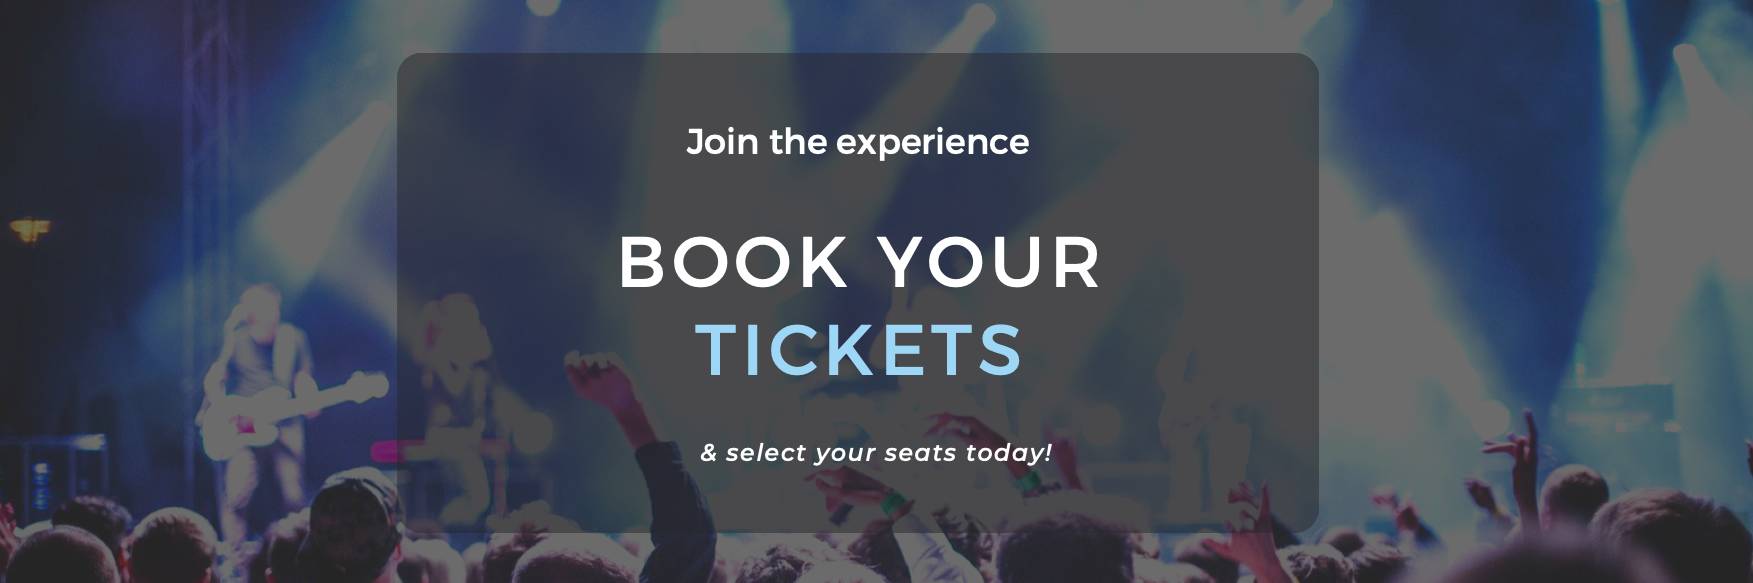 blossom music center tickets